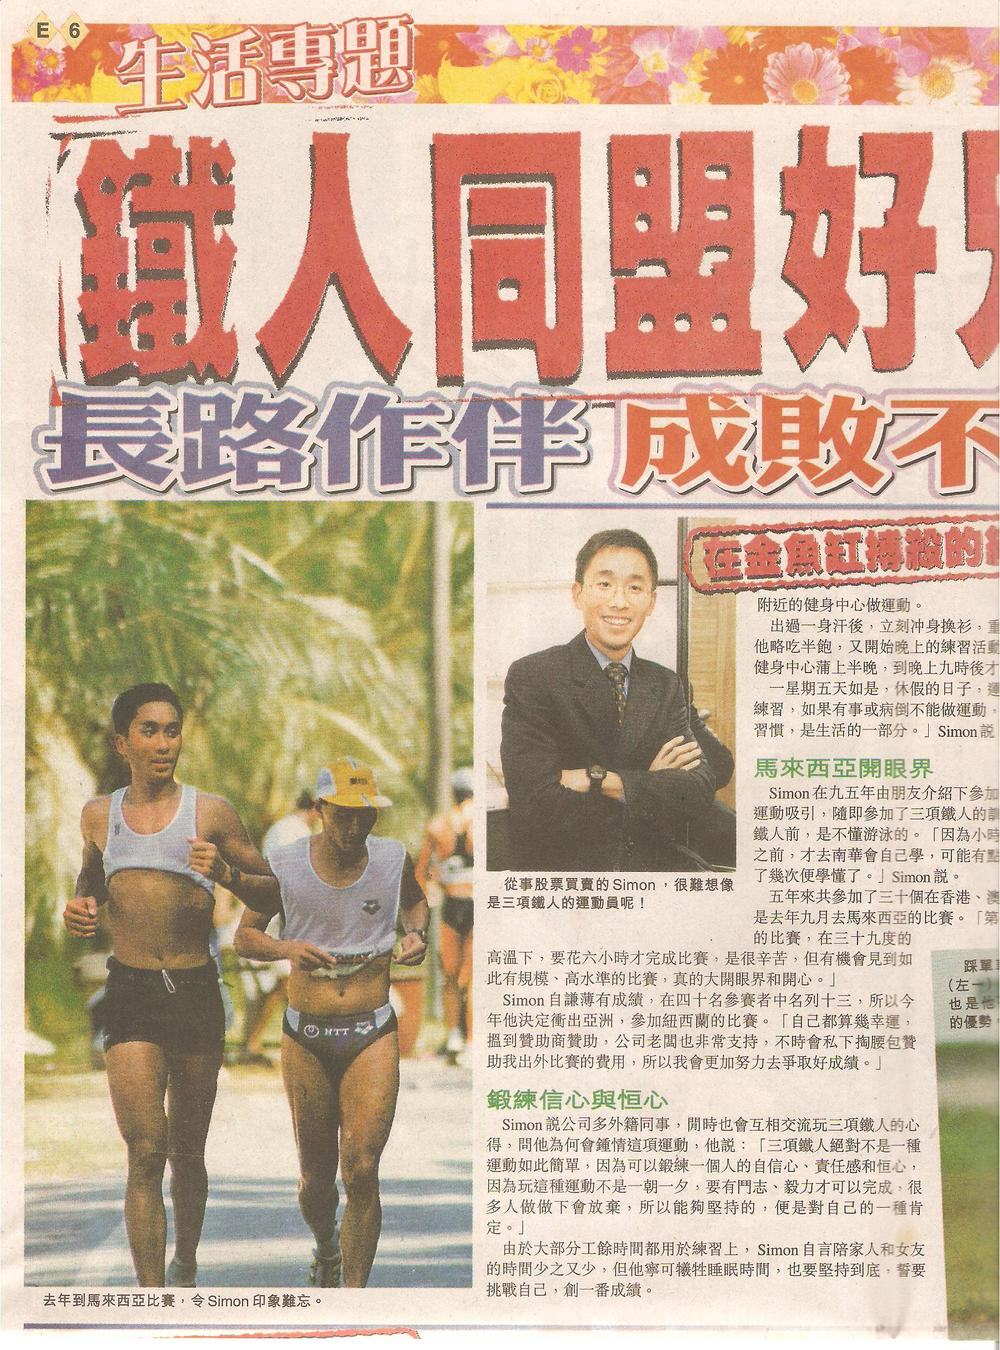 news-1-4.jpg